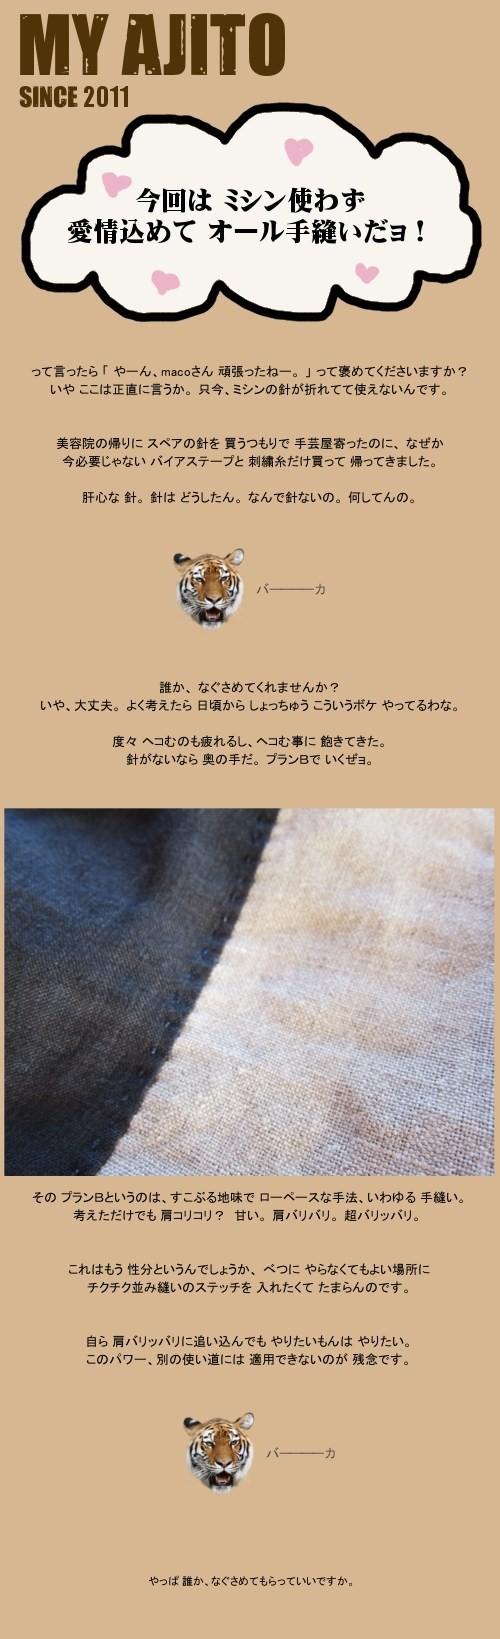 bac_04.jpg